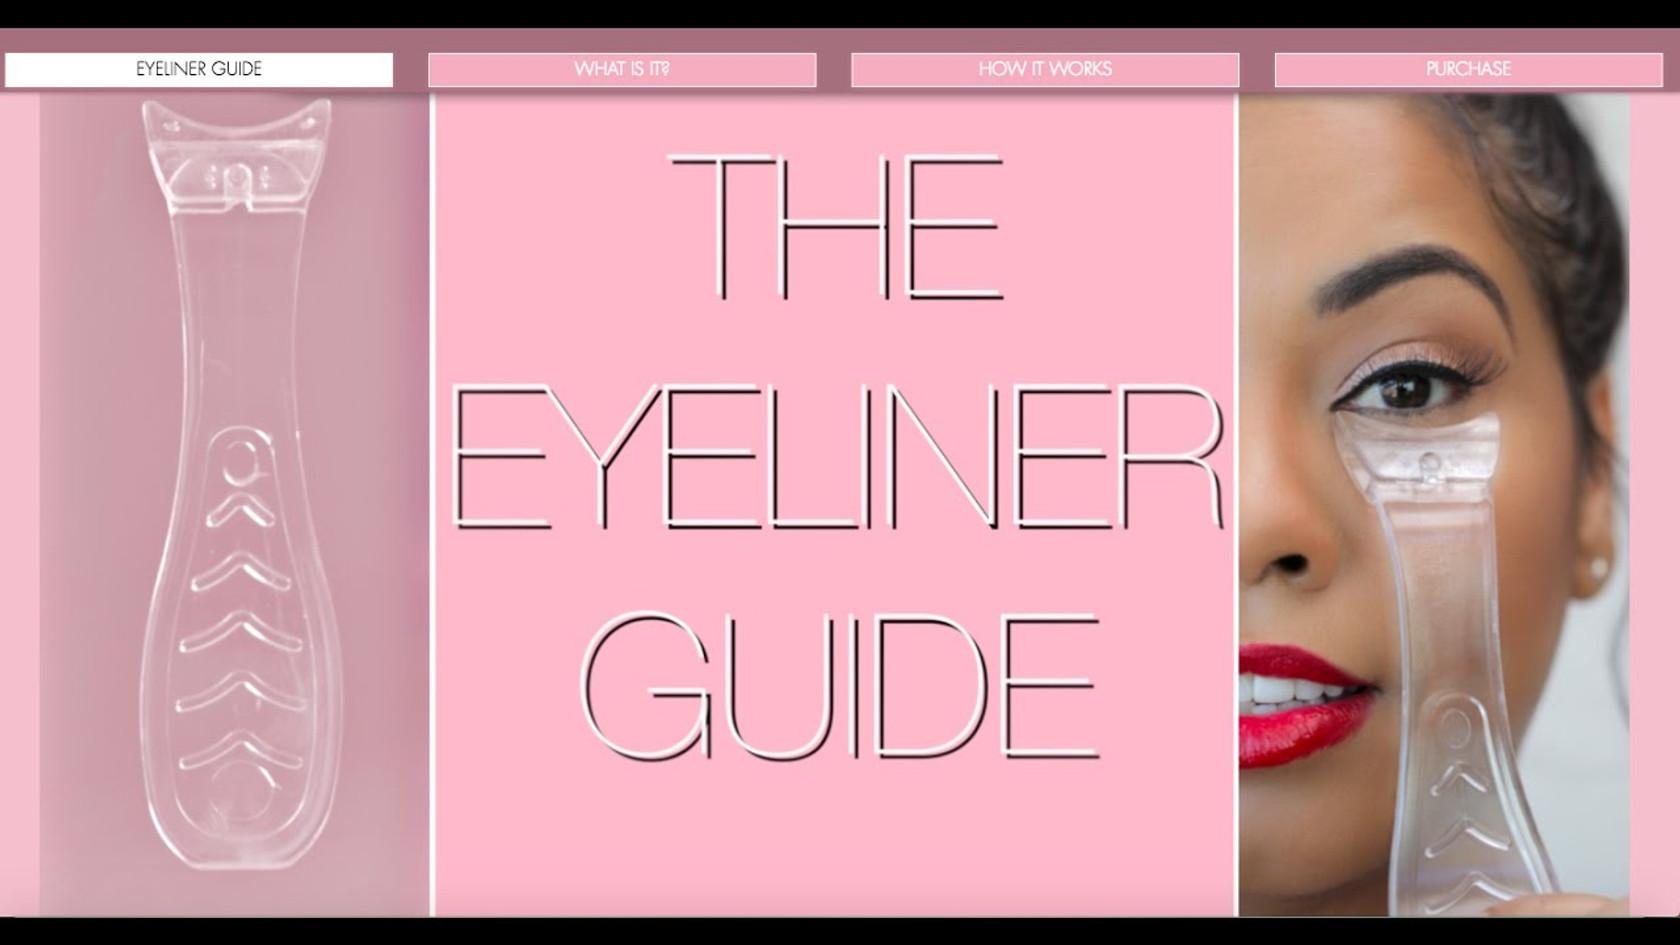 The Eye Liner Guide